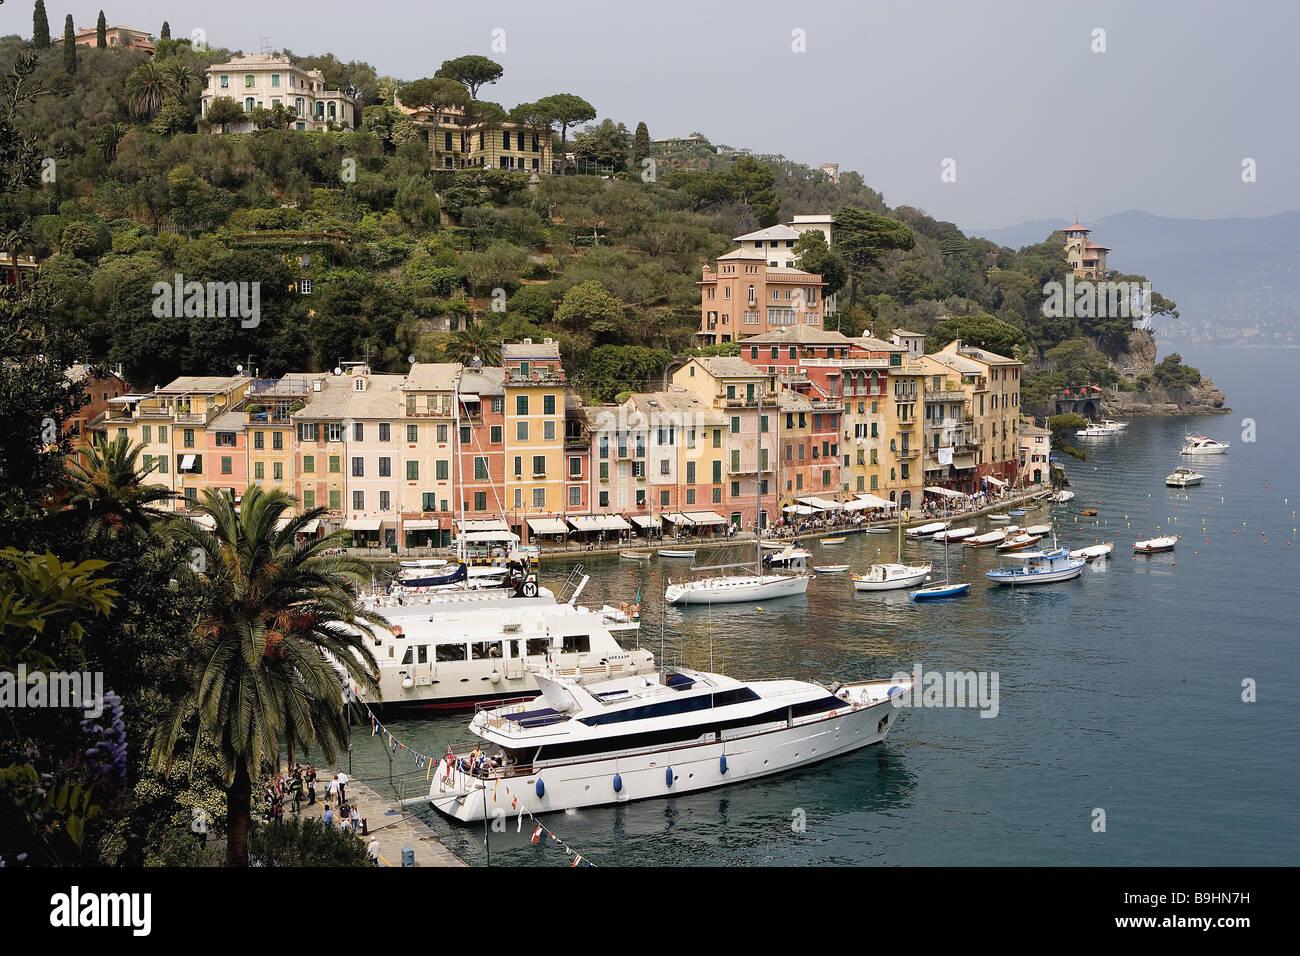 Italy Liguria coast Portofino locality perspective harbor